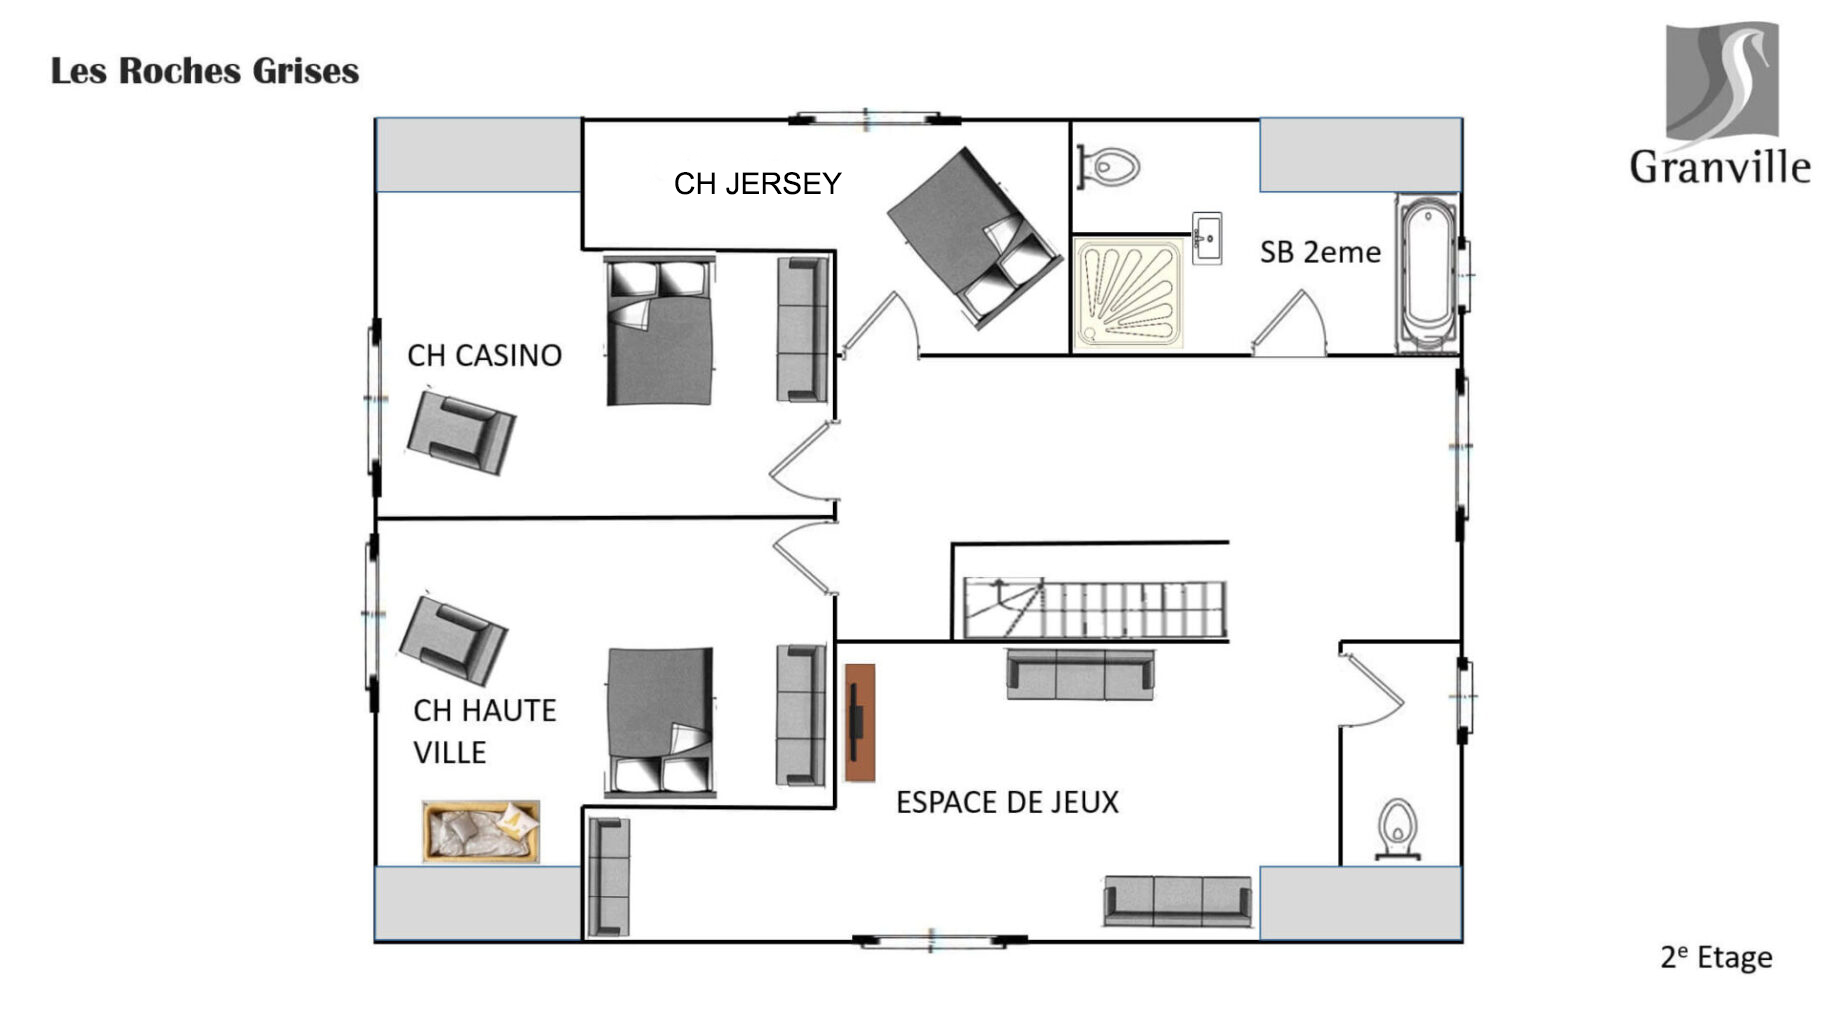 Les-roches-grises-2eme-etage-scaled2